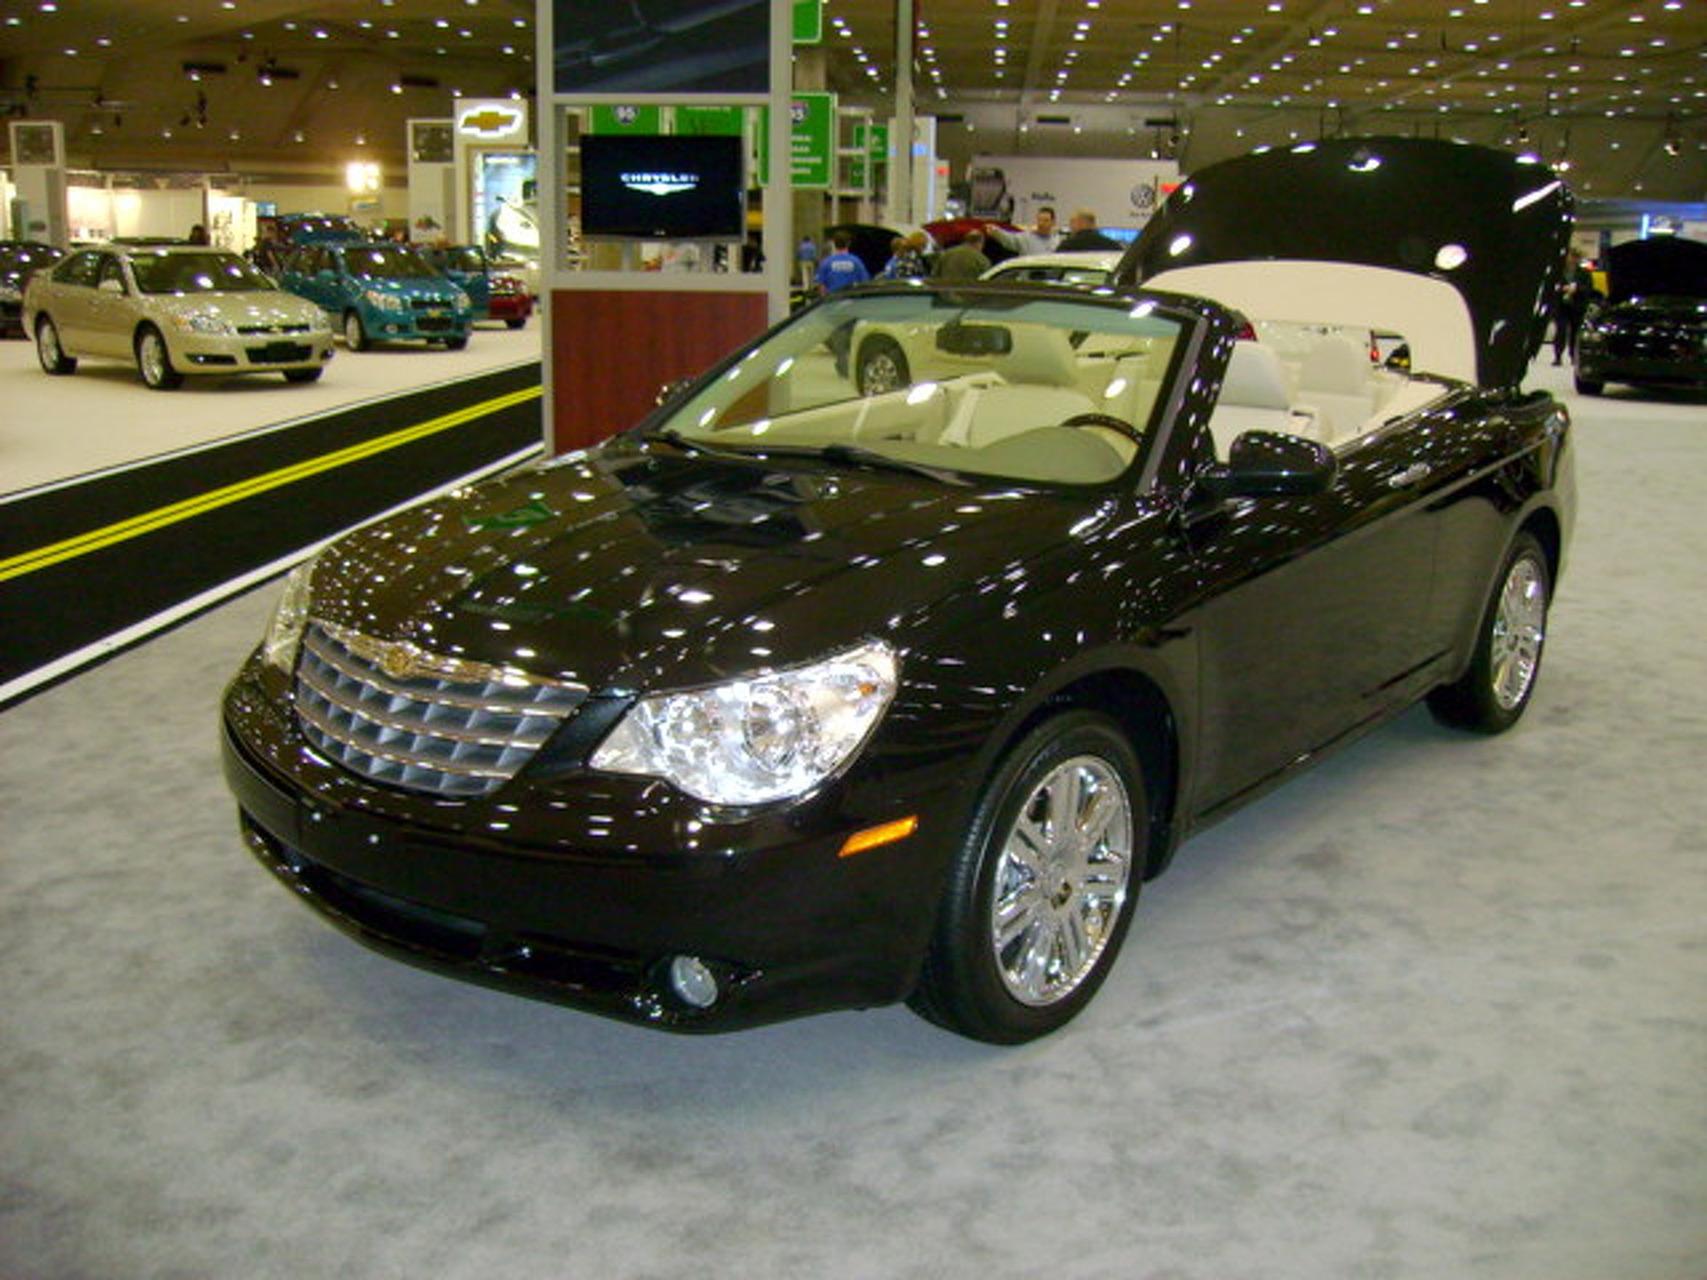 Chrysler Sebring Convertible